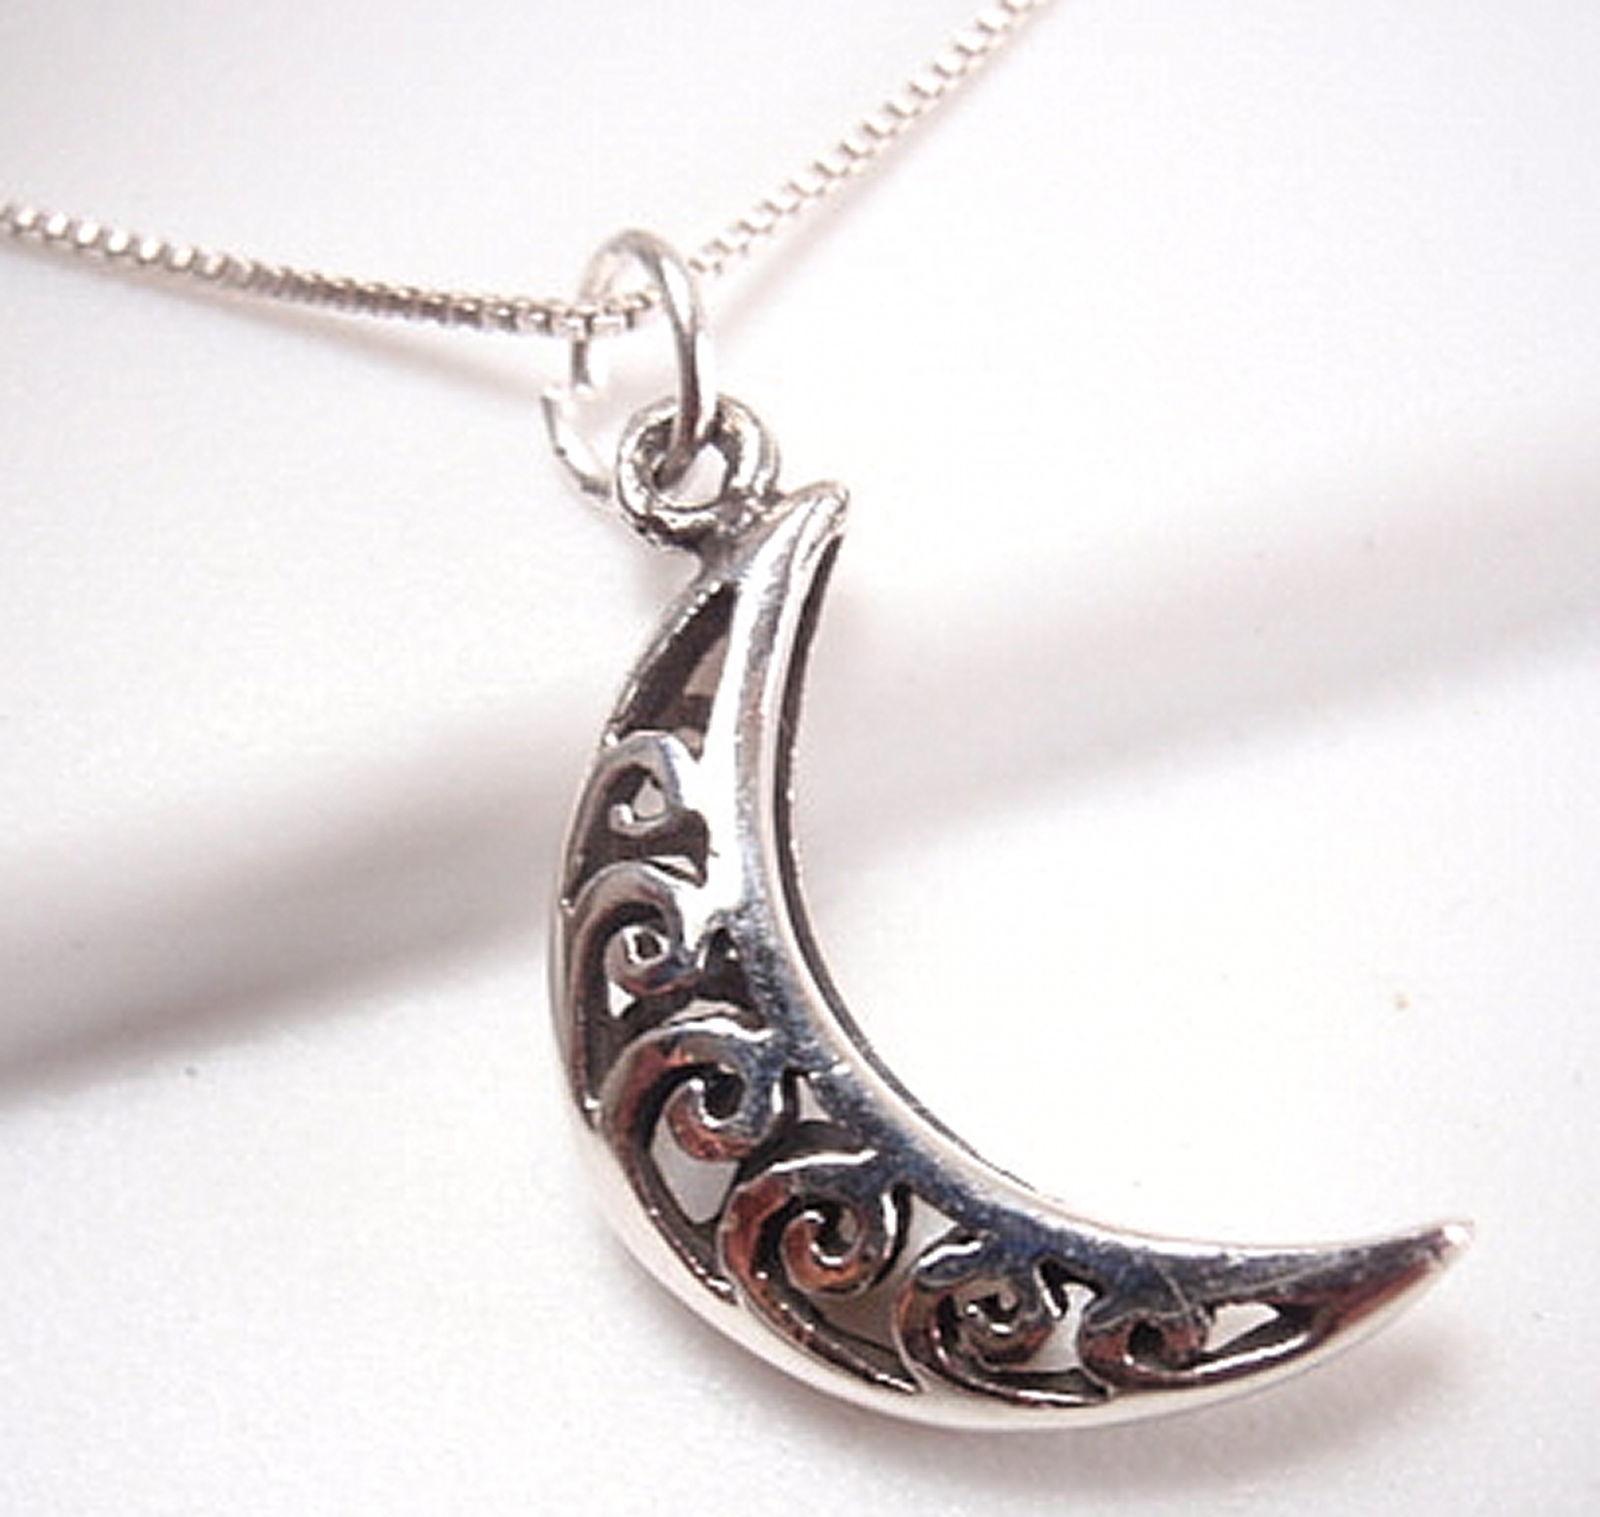 Half Moon Filigree Necklace 925 Sterling Silver Corona Sun Jewelry